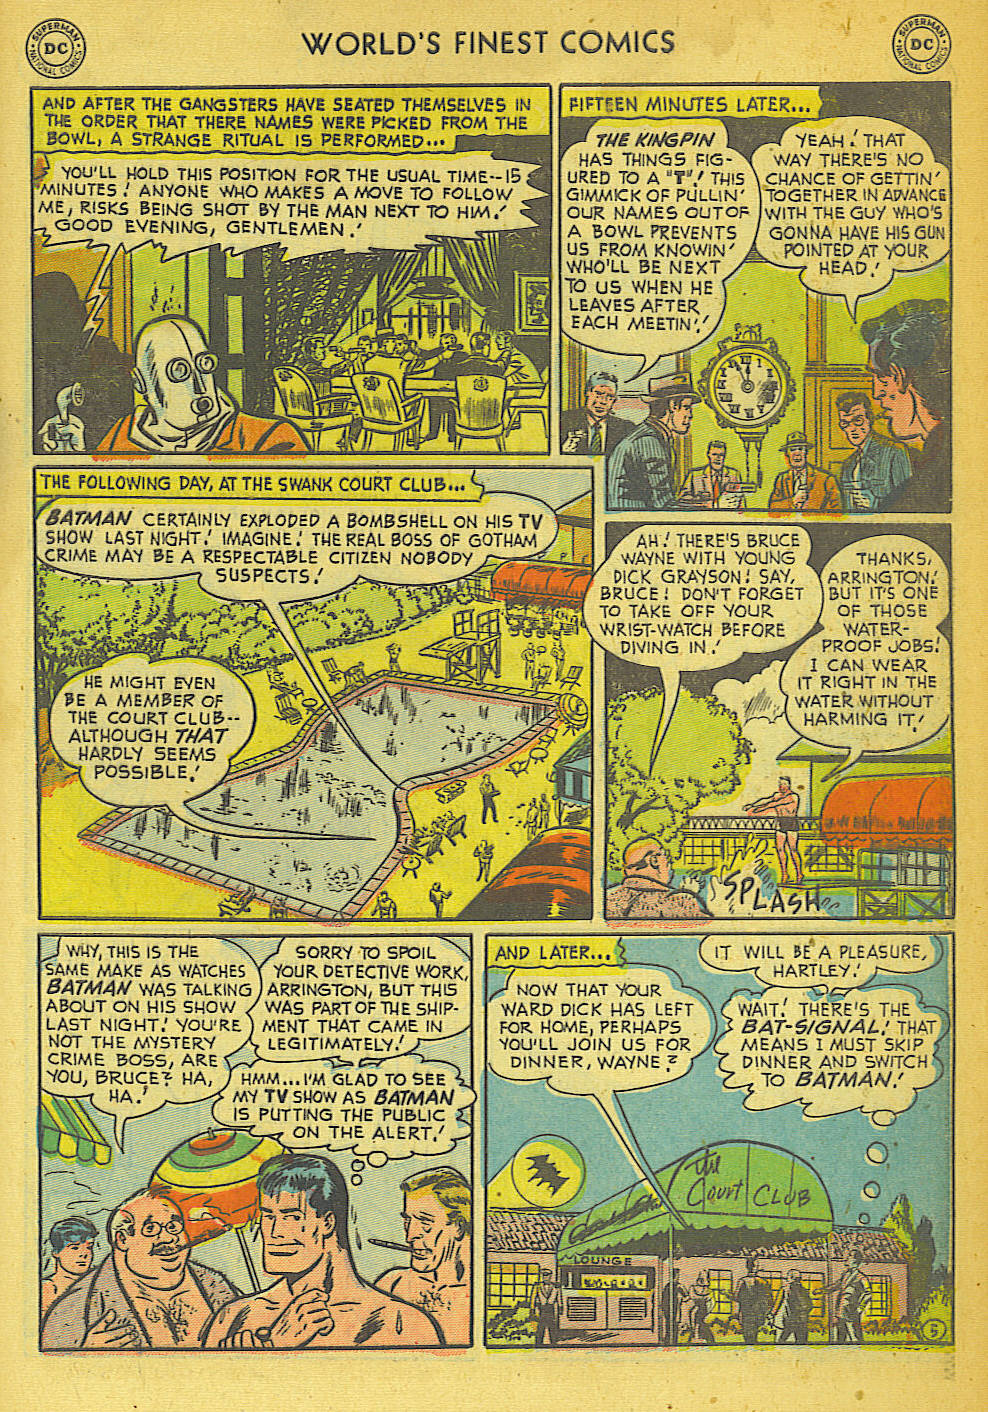 Read online World's Finest Comics comic -  Issue #57 - 57